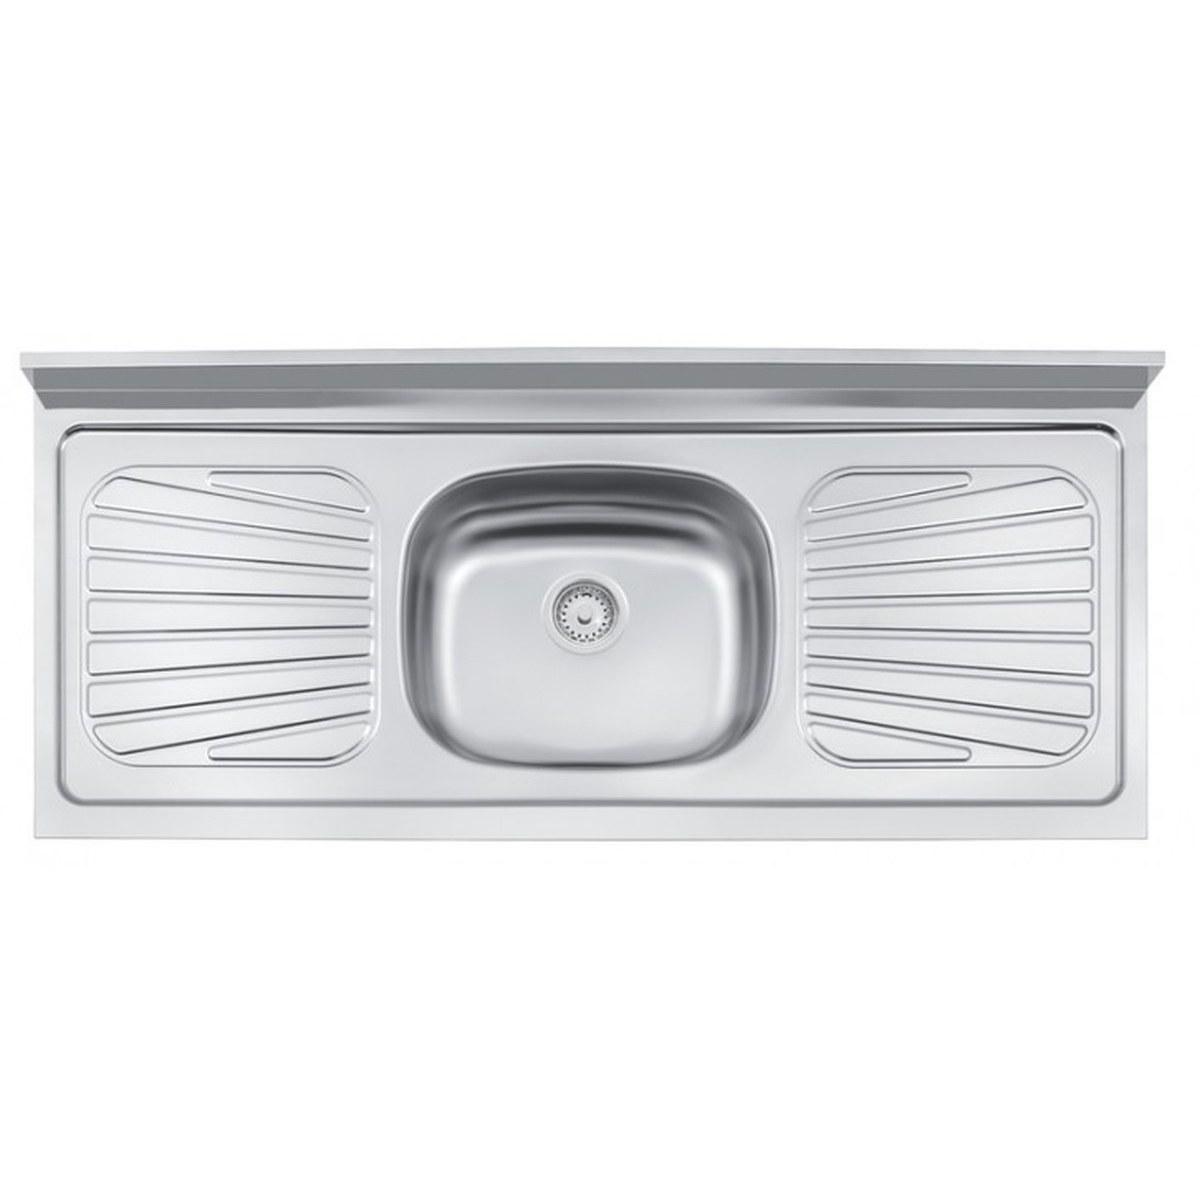 Pia Inox 1,50x52 Standard Raggi 40 S/ Valv 93042/506 Tramontina